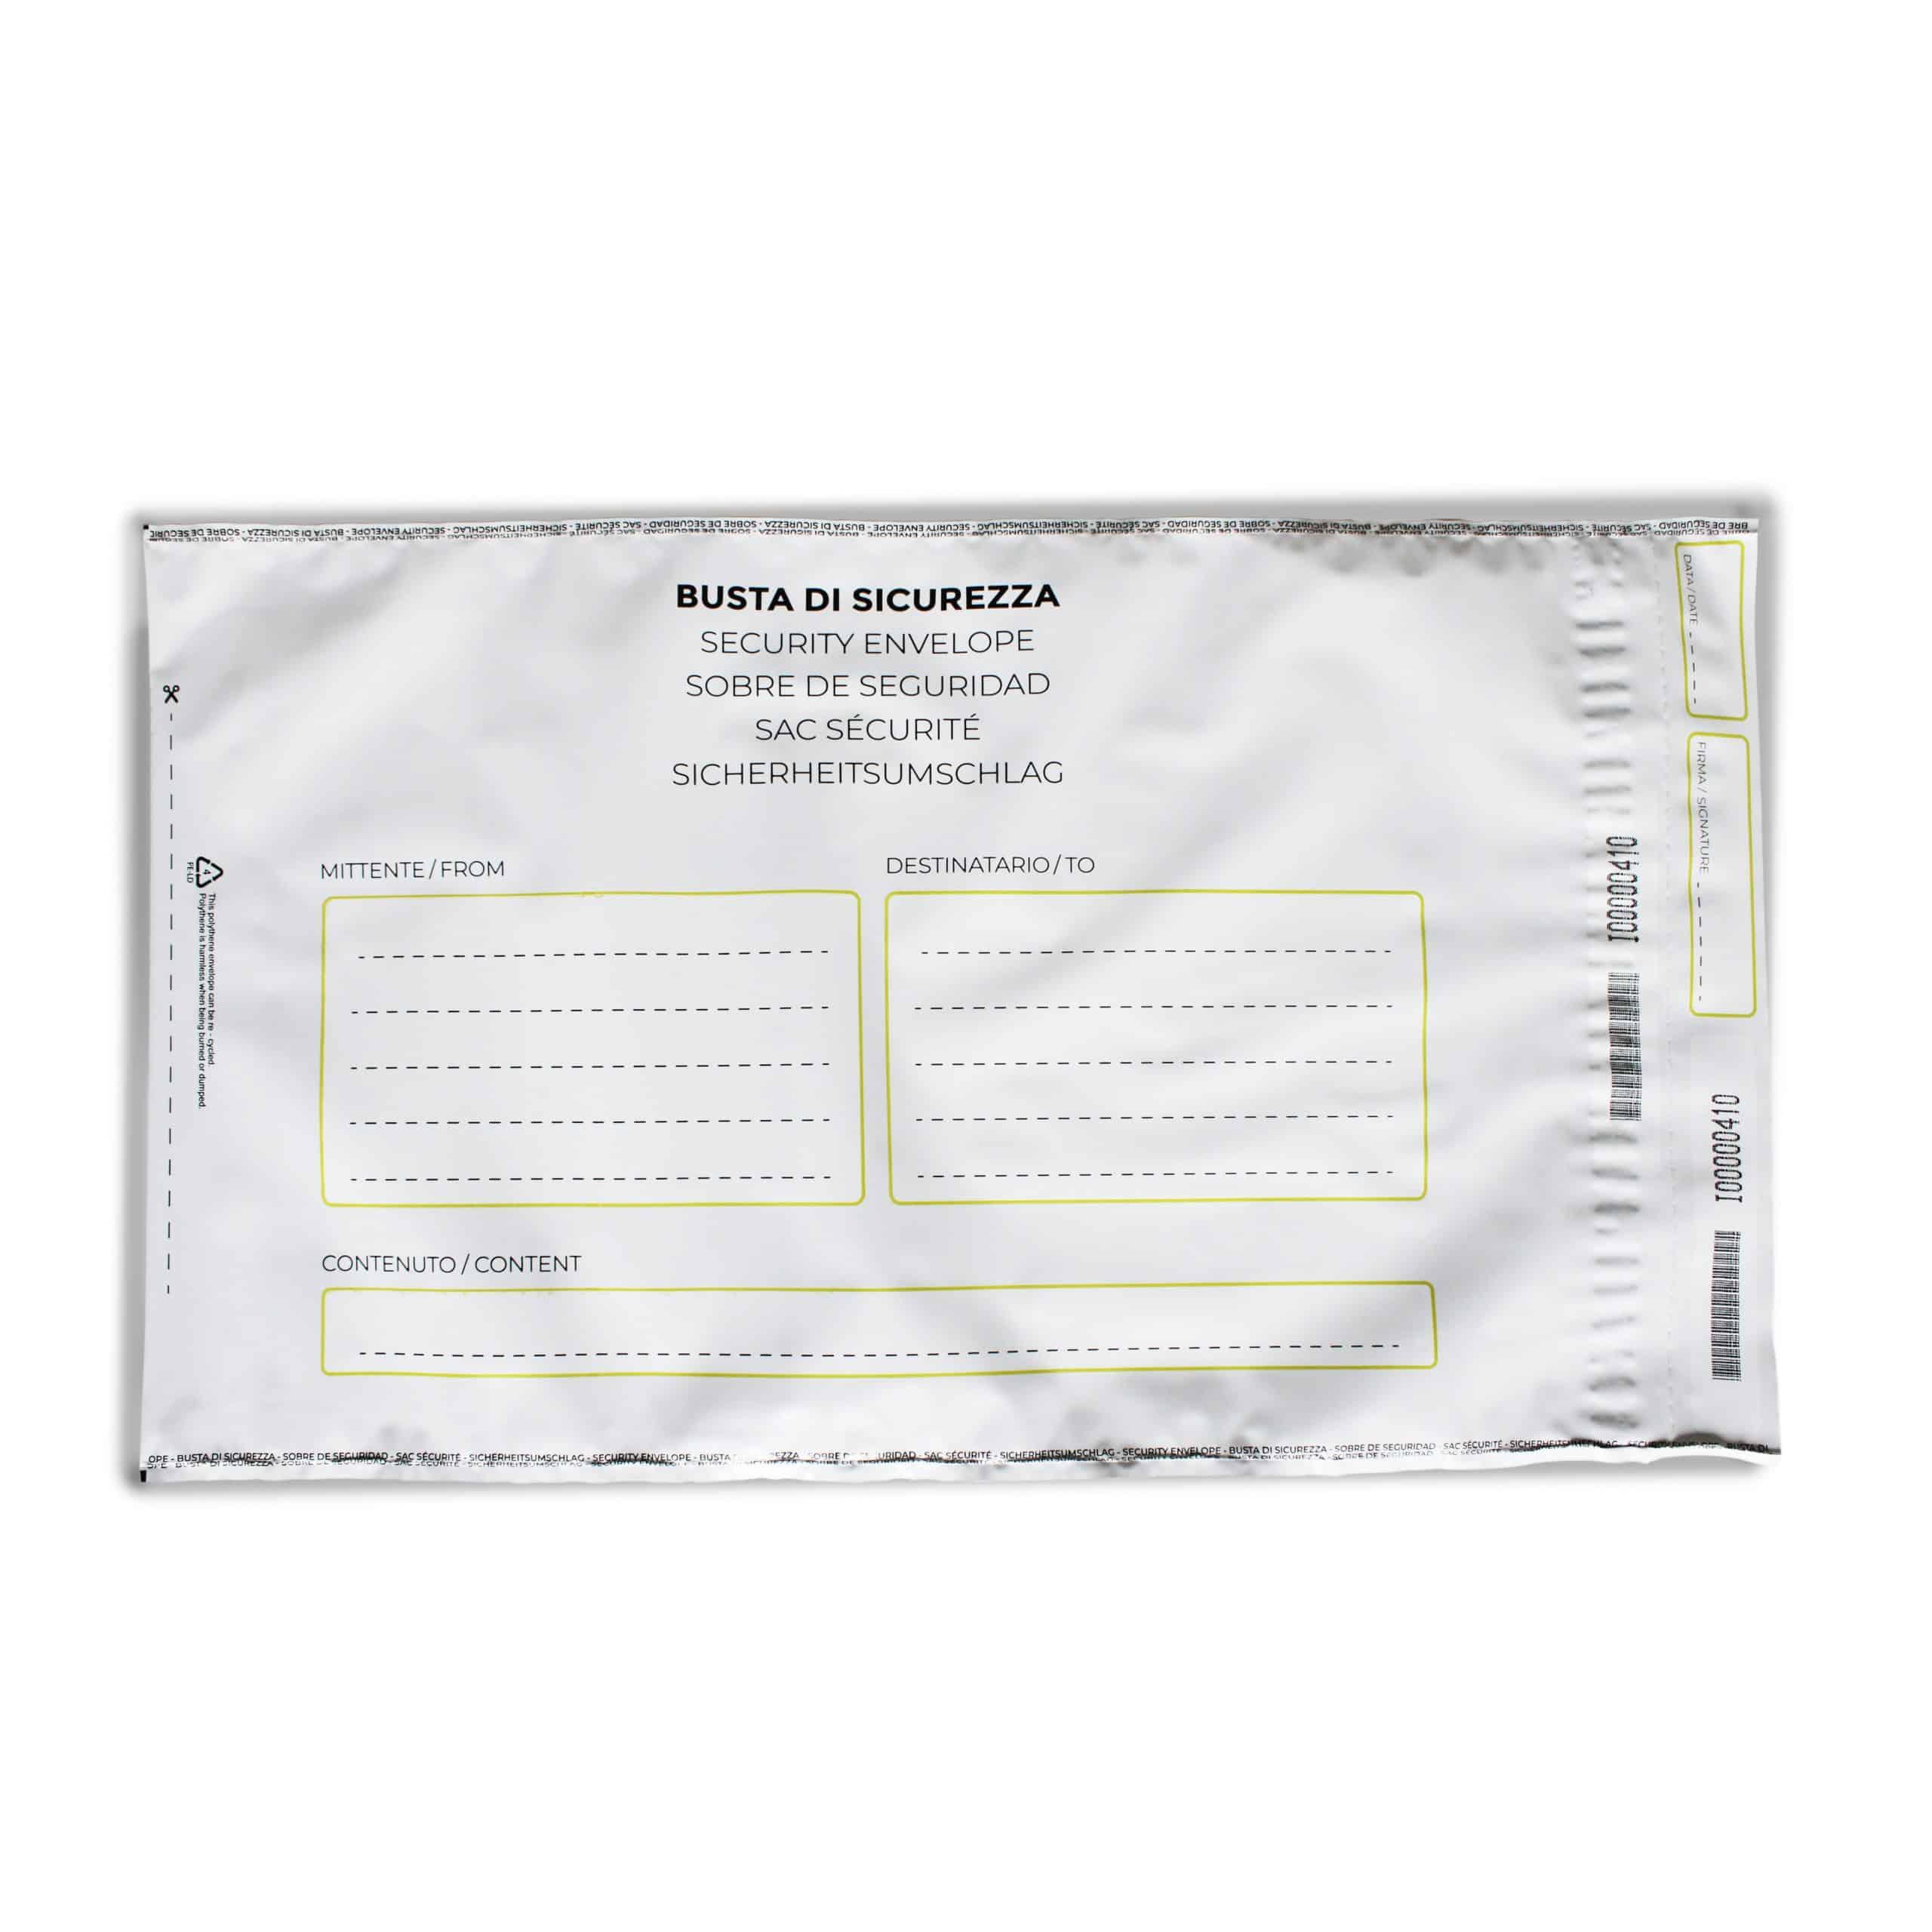 Busta di sicurezza - shipping bags envelopes Oniloc